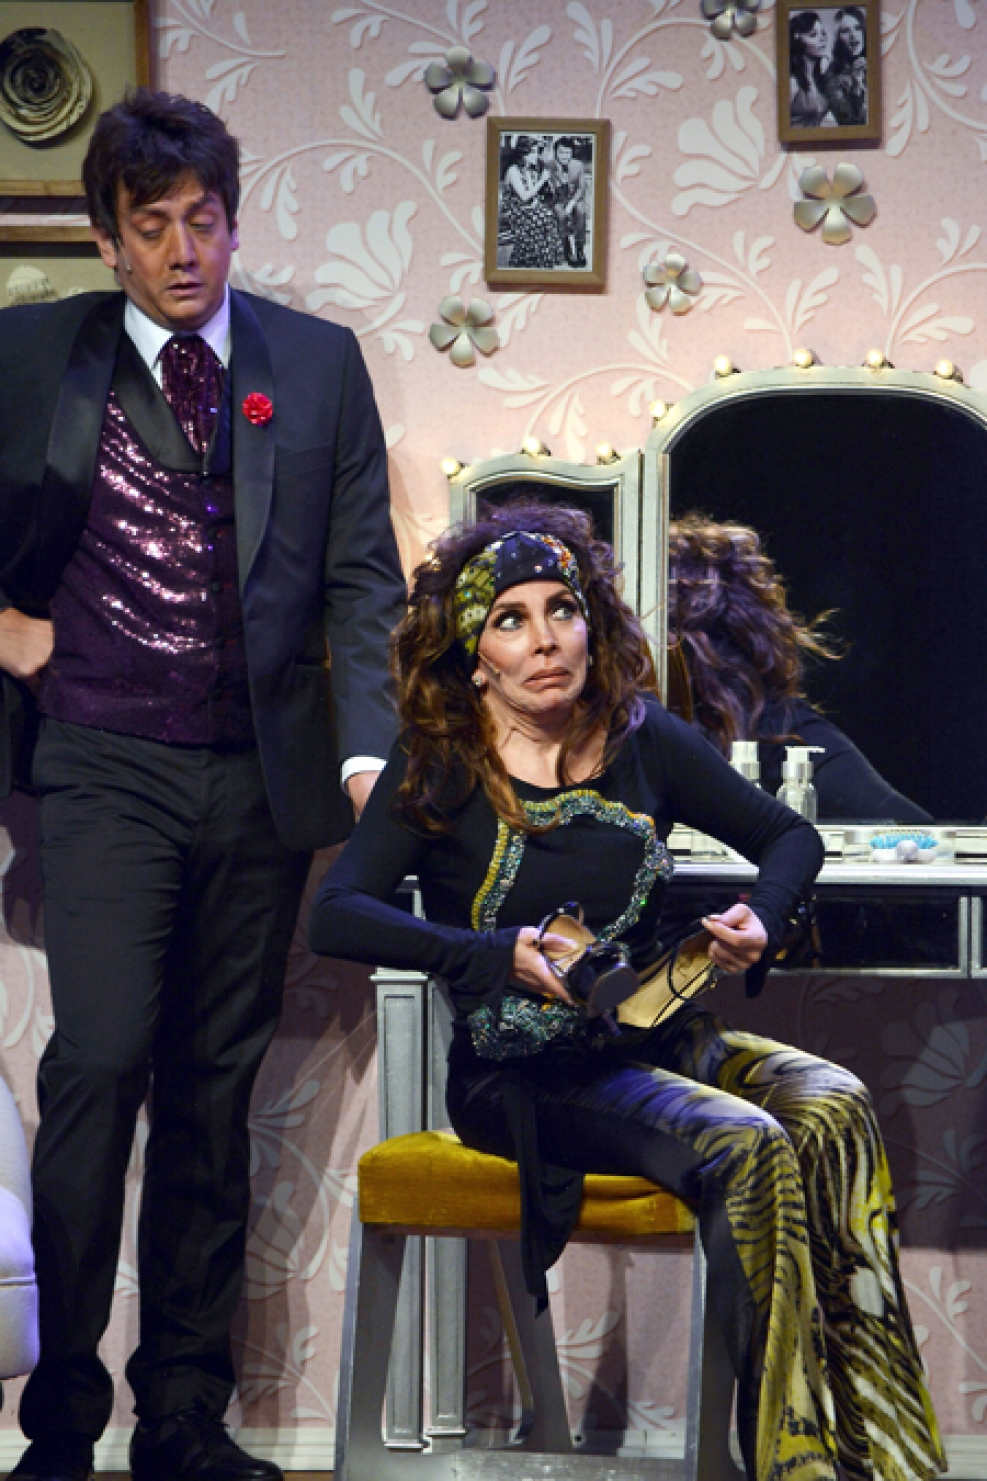 http://media.telemundo51.com/images/987*1481/veronica-castro-teatro-aplauso-16.jpg